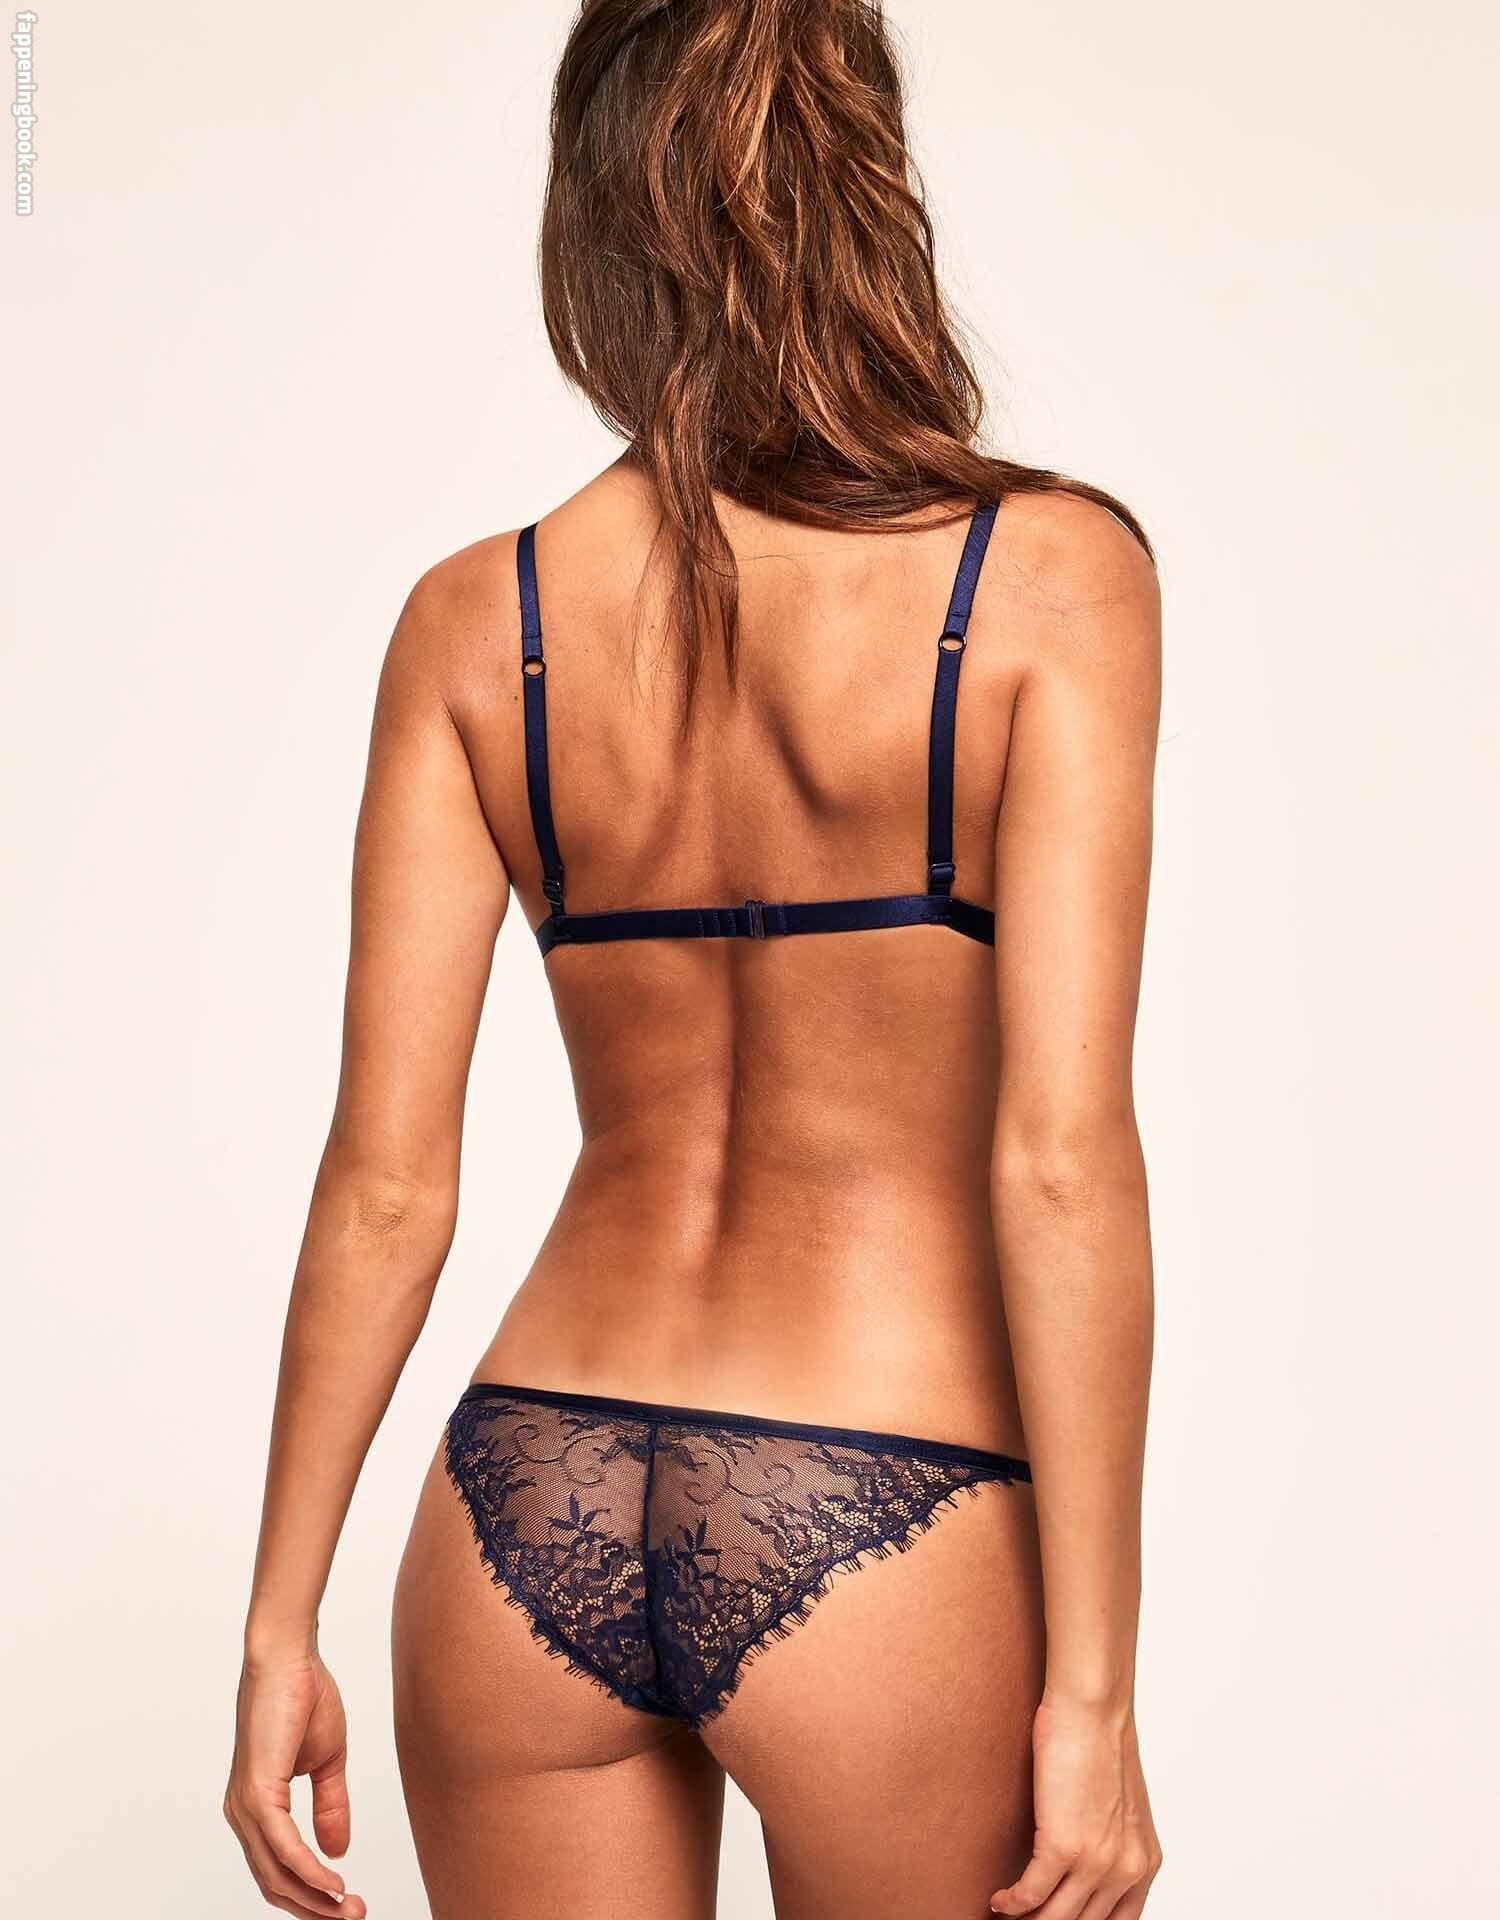 Gabrielle Caunesil Nude